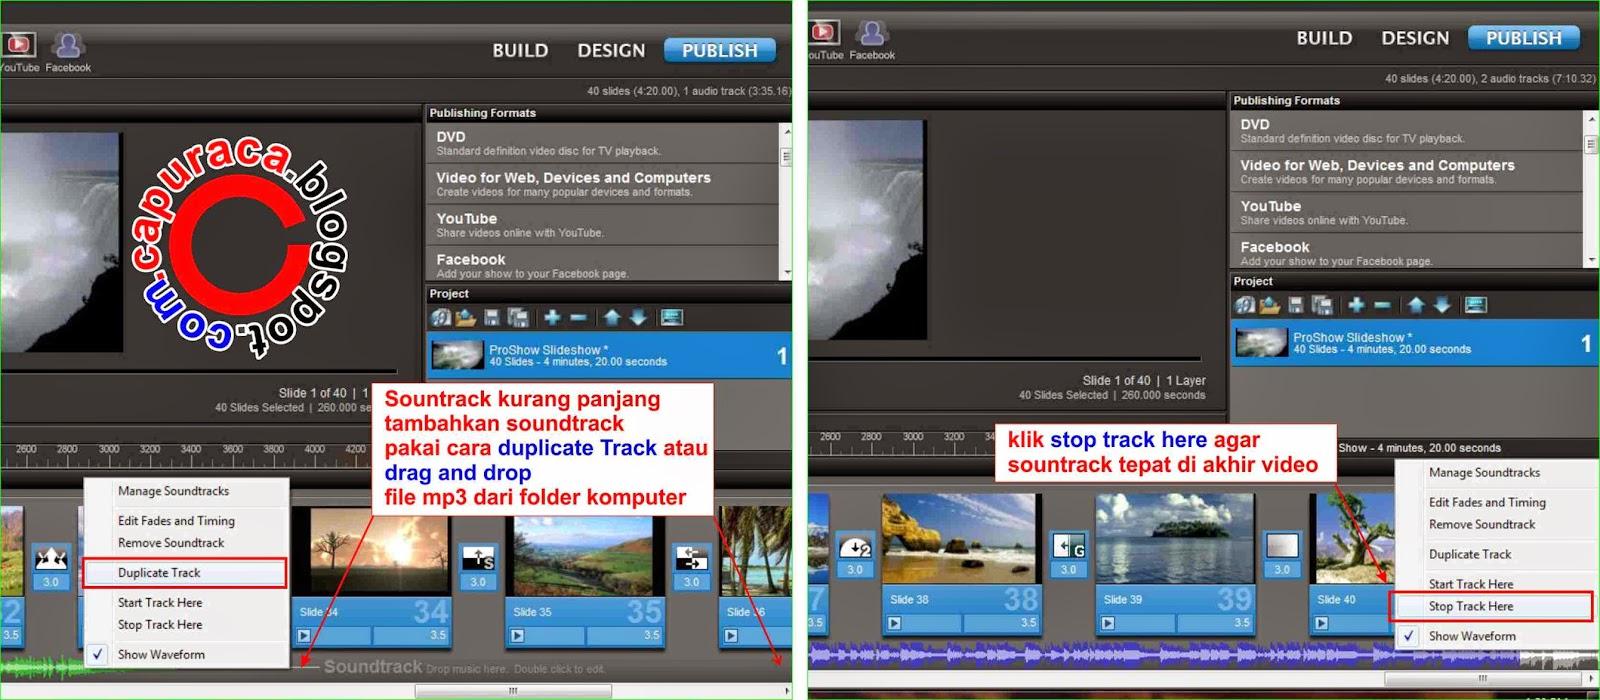 Cara membuat video dari kumpulan gambar atau foto,proshow producer,